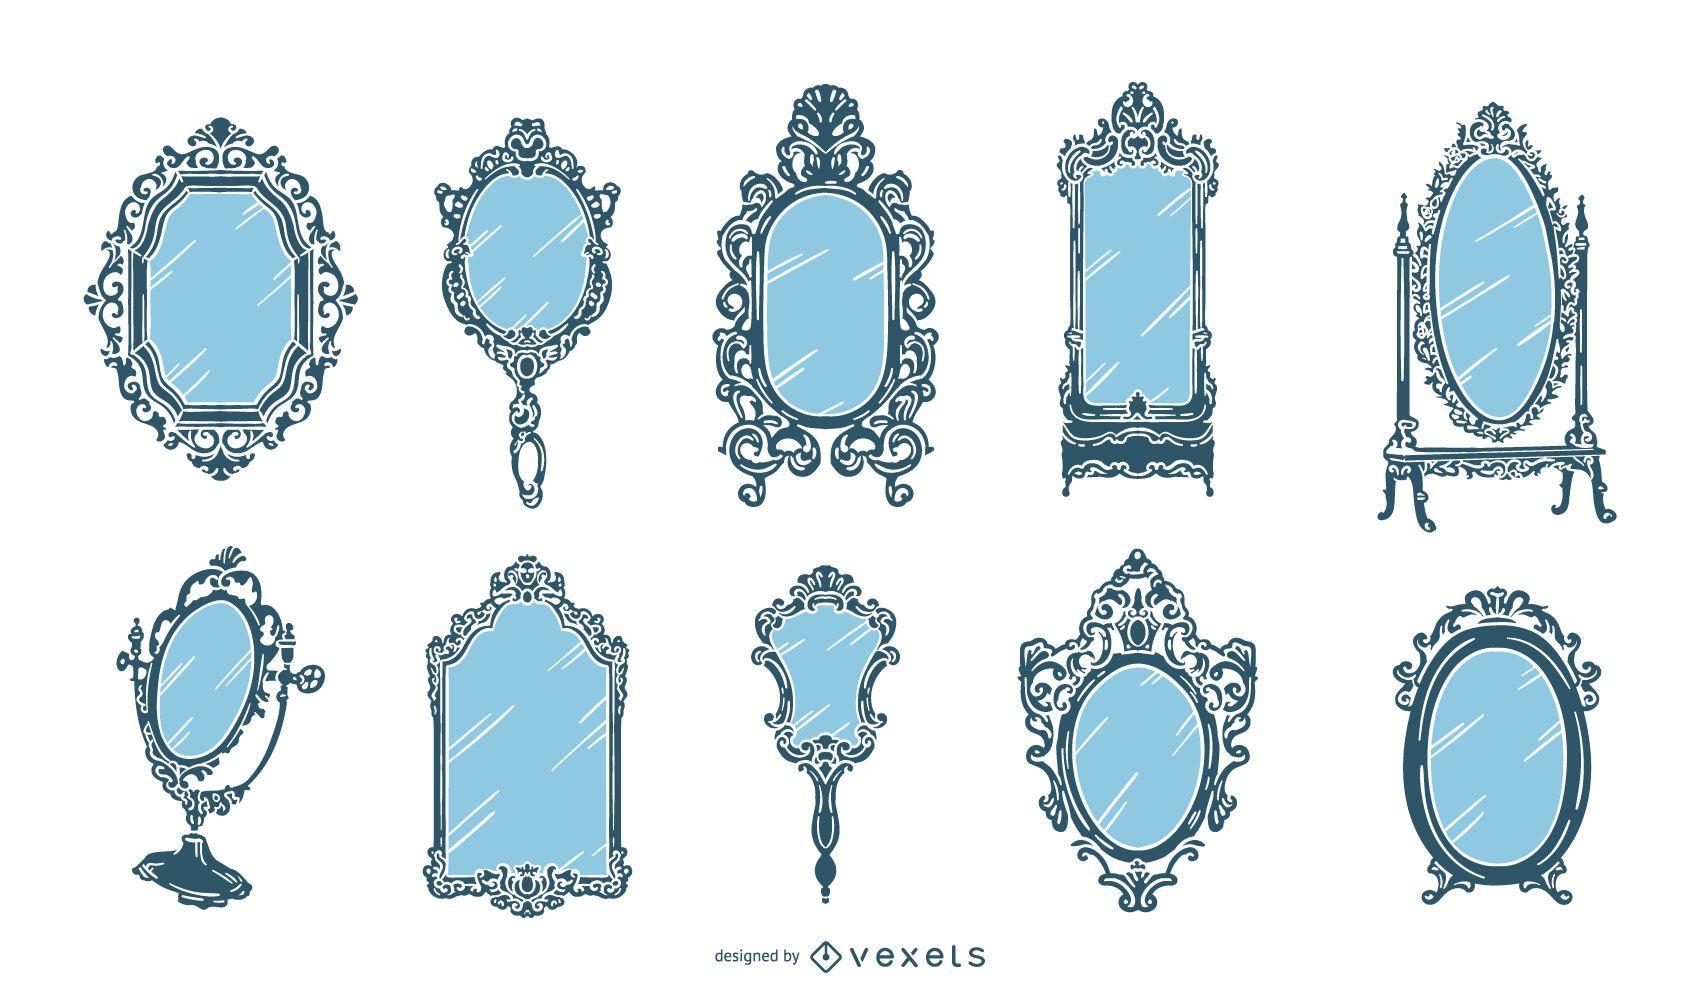 Old Vintage Mirror Design Collection